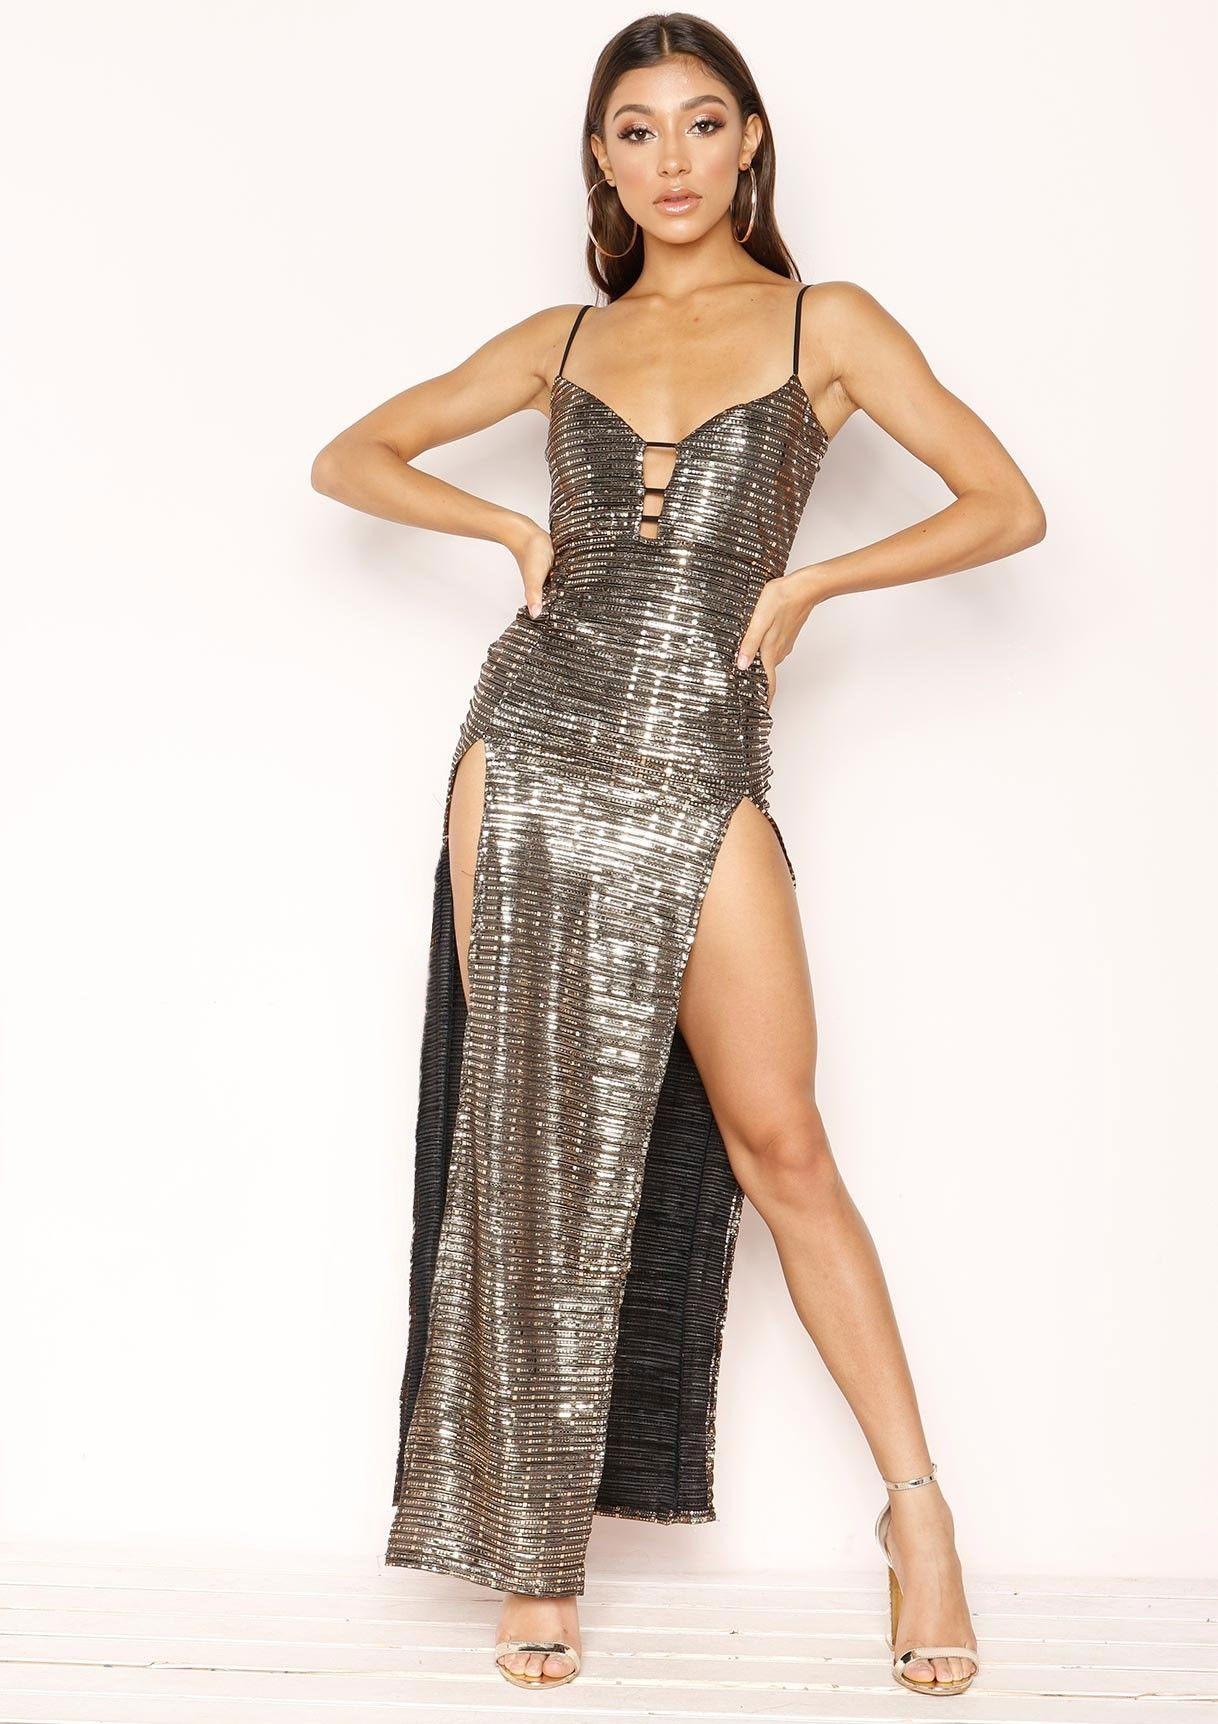 ed75691a580 Missyempire - Hilary Gold Sequin Split Maxi Dress